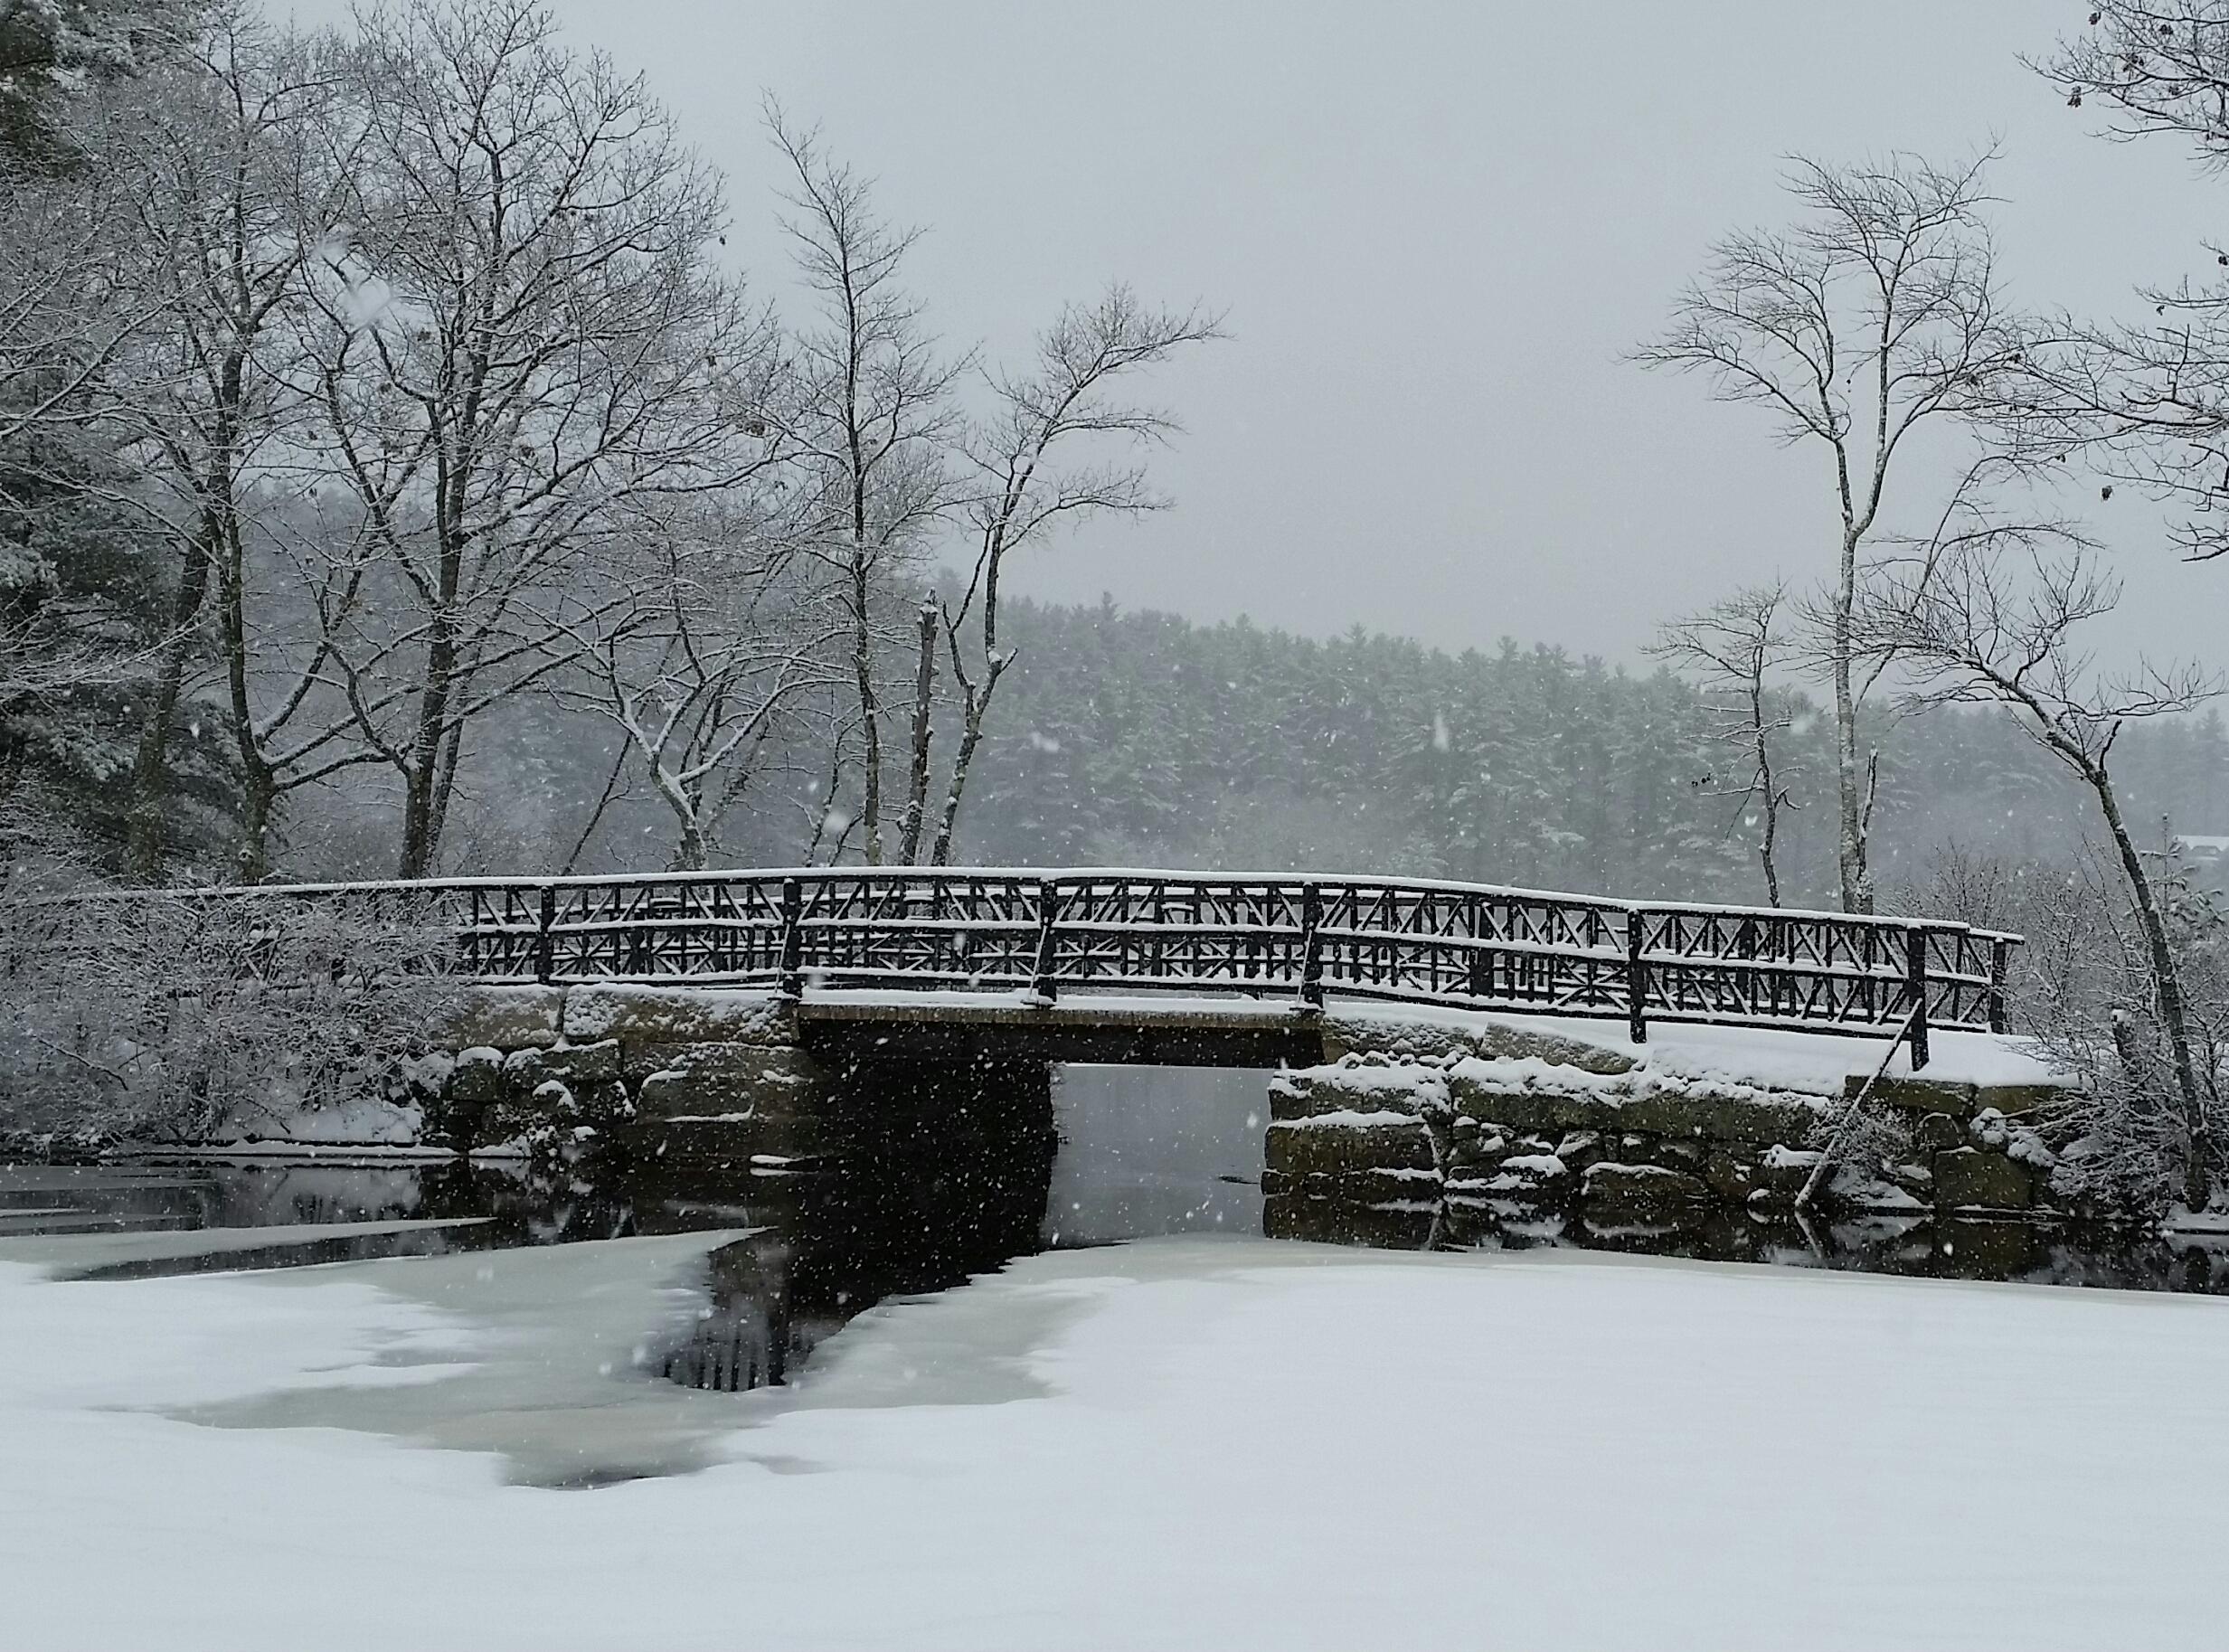 Snowfall on the Narrows